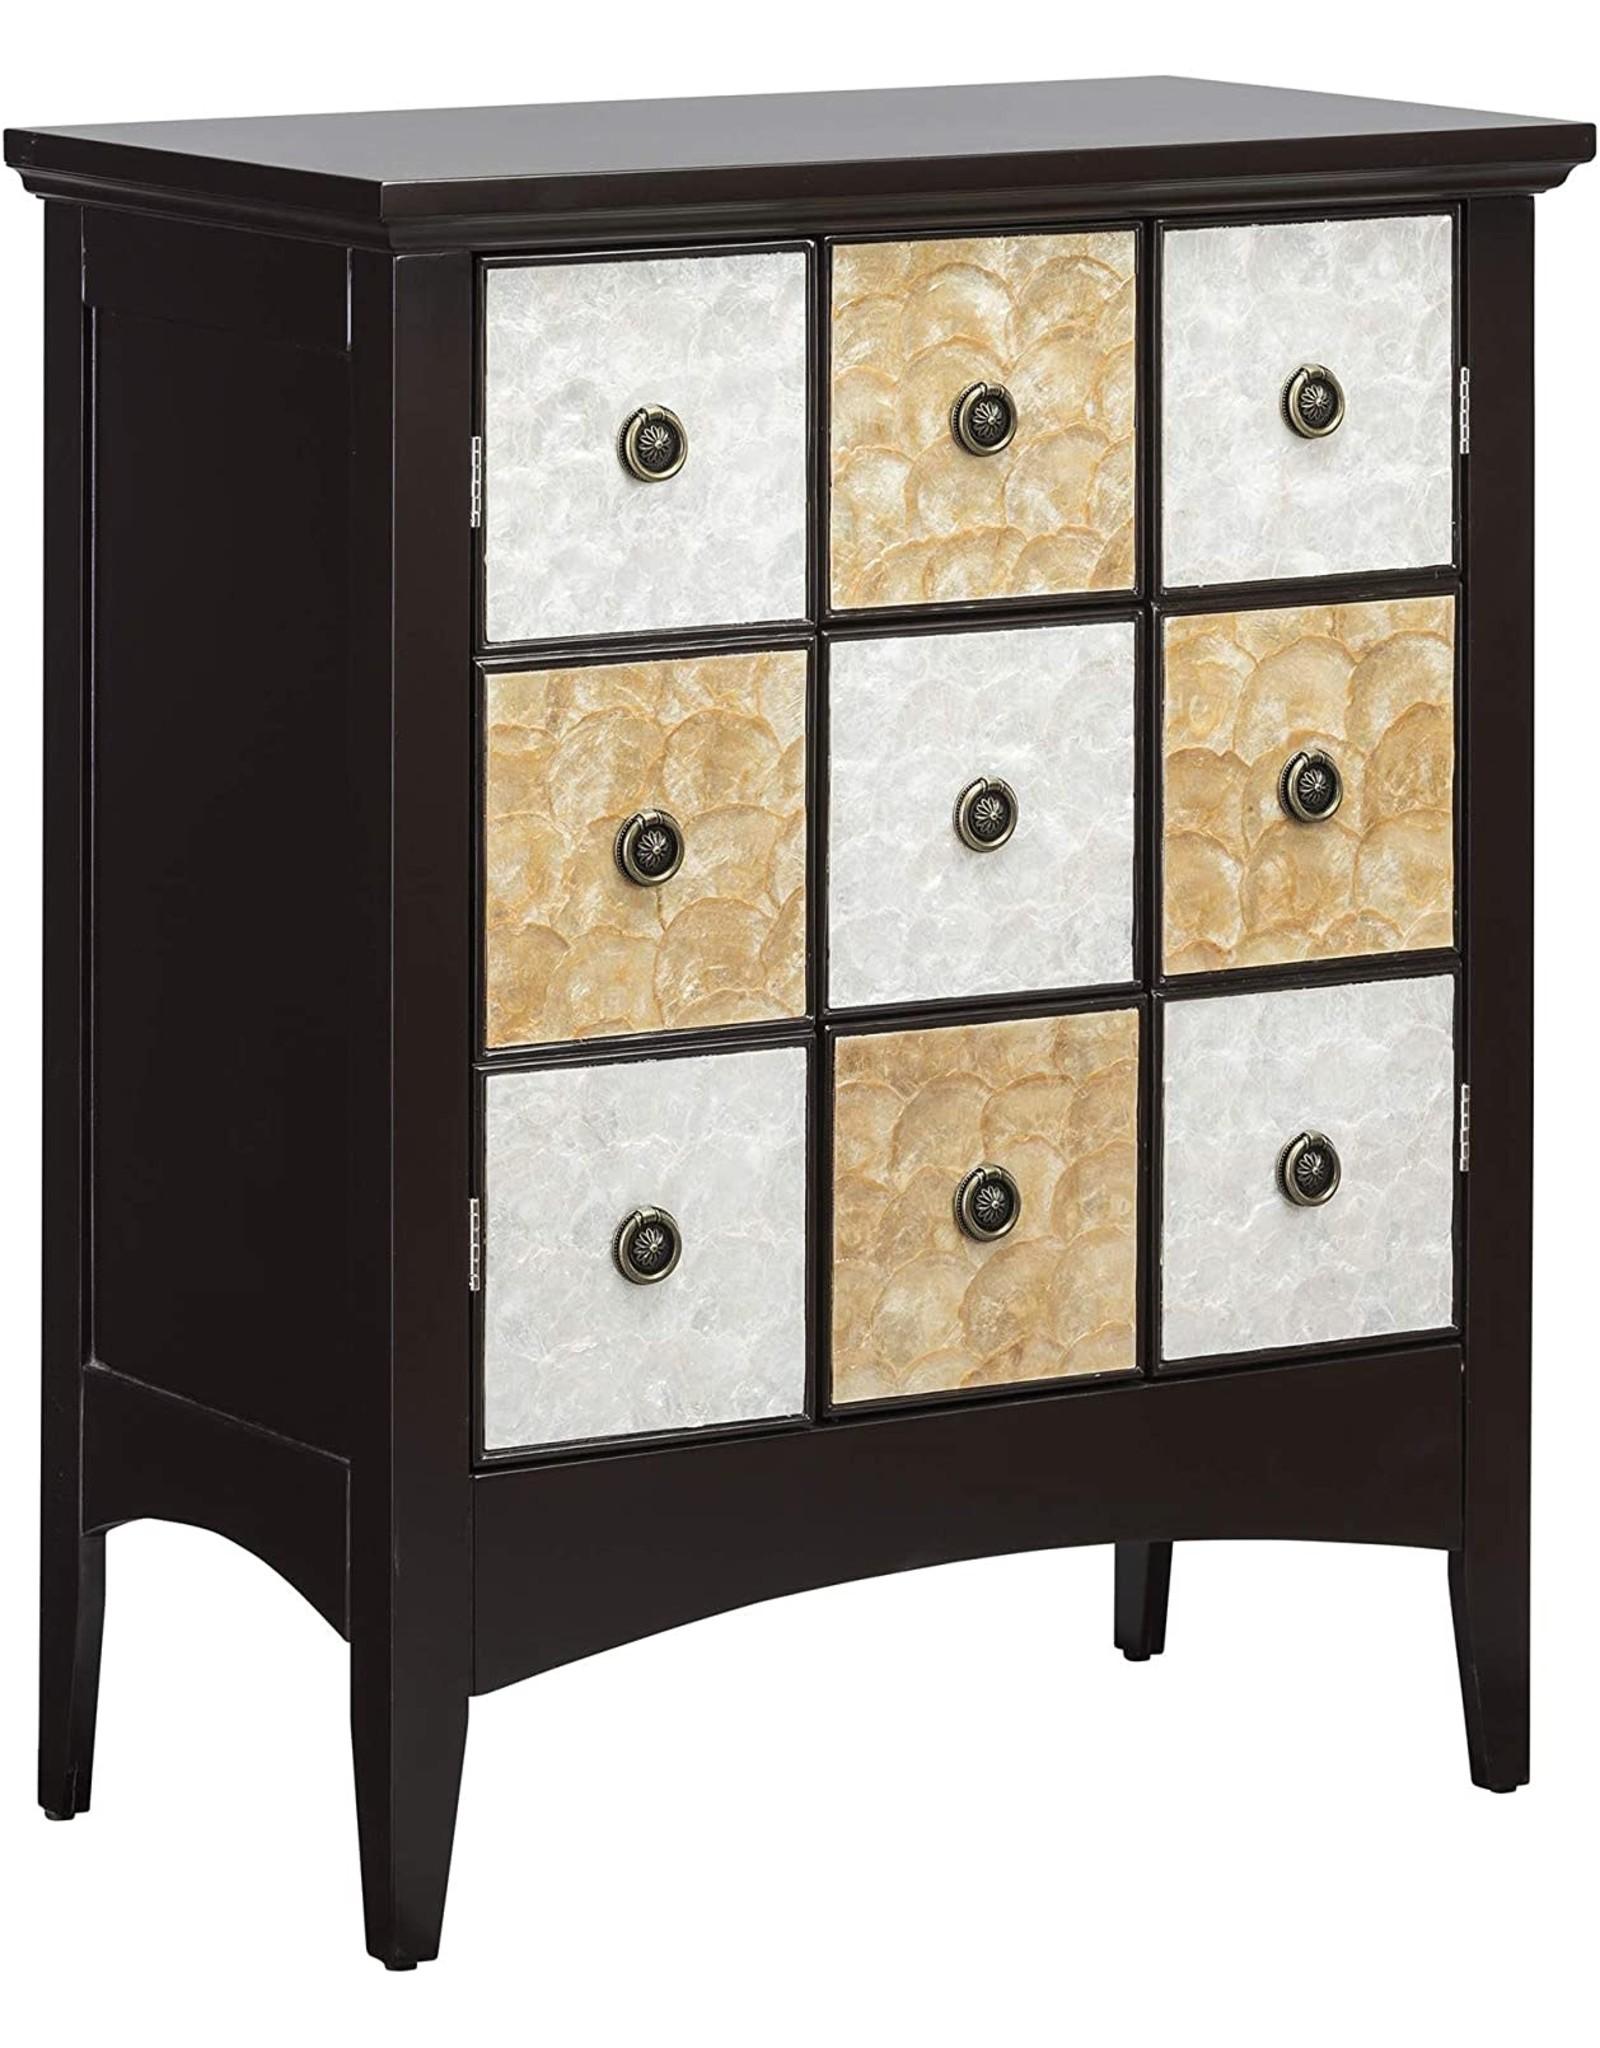 Elegant Home Fashions Elegant Home Fashions ELG-658 Cabinet